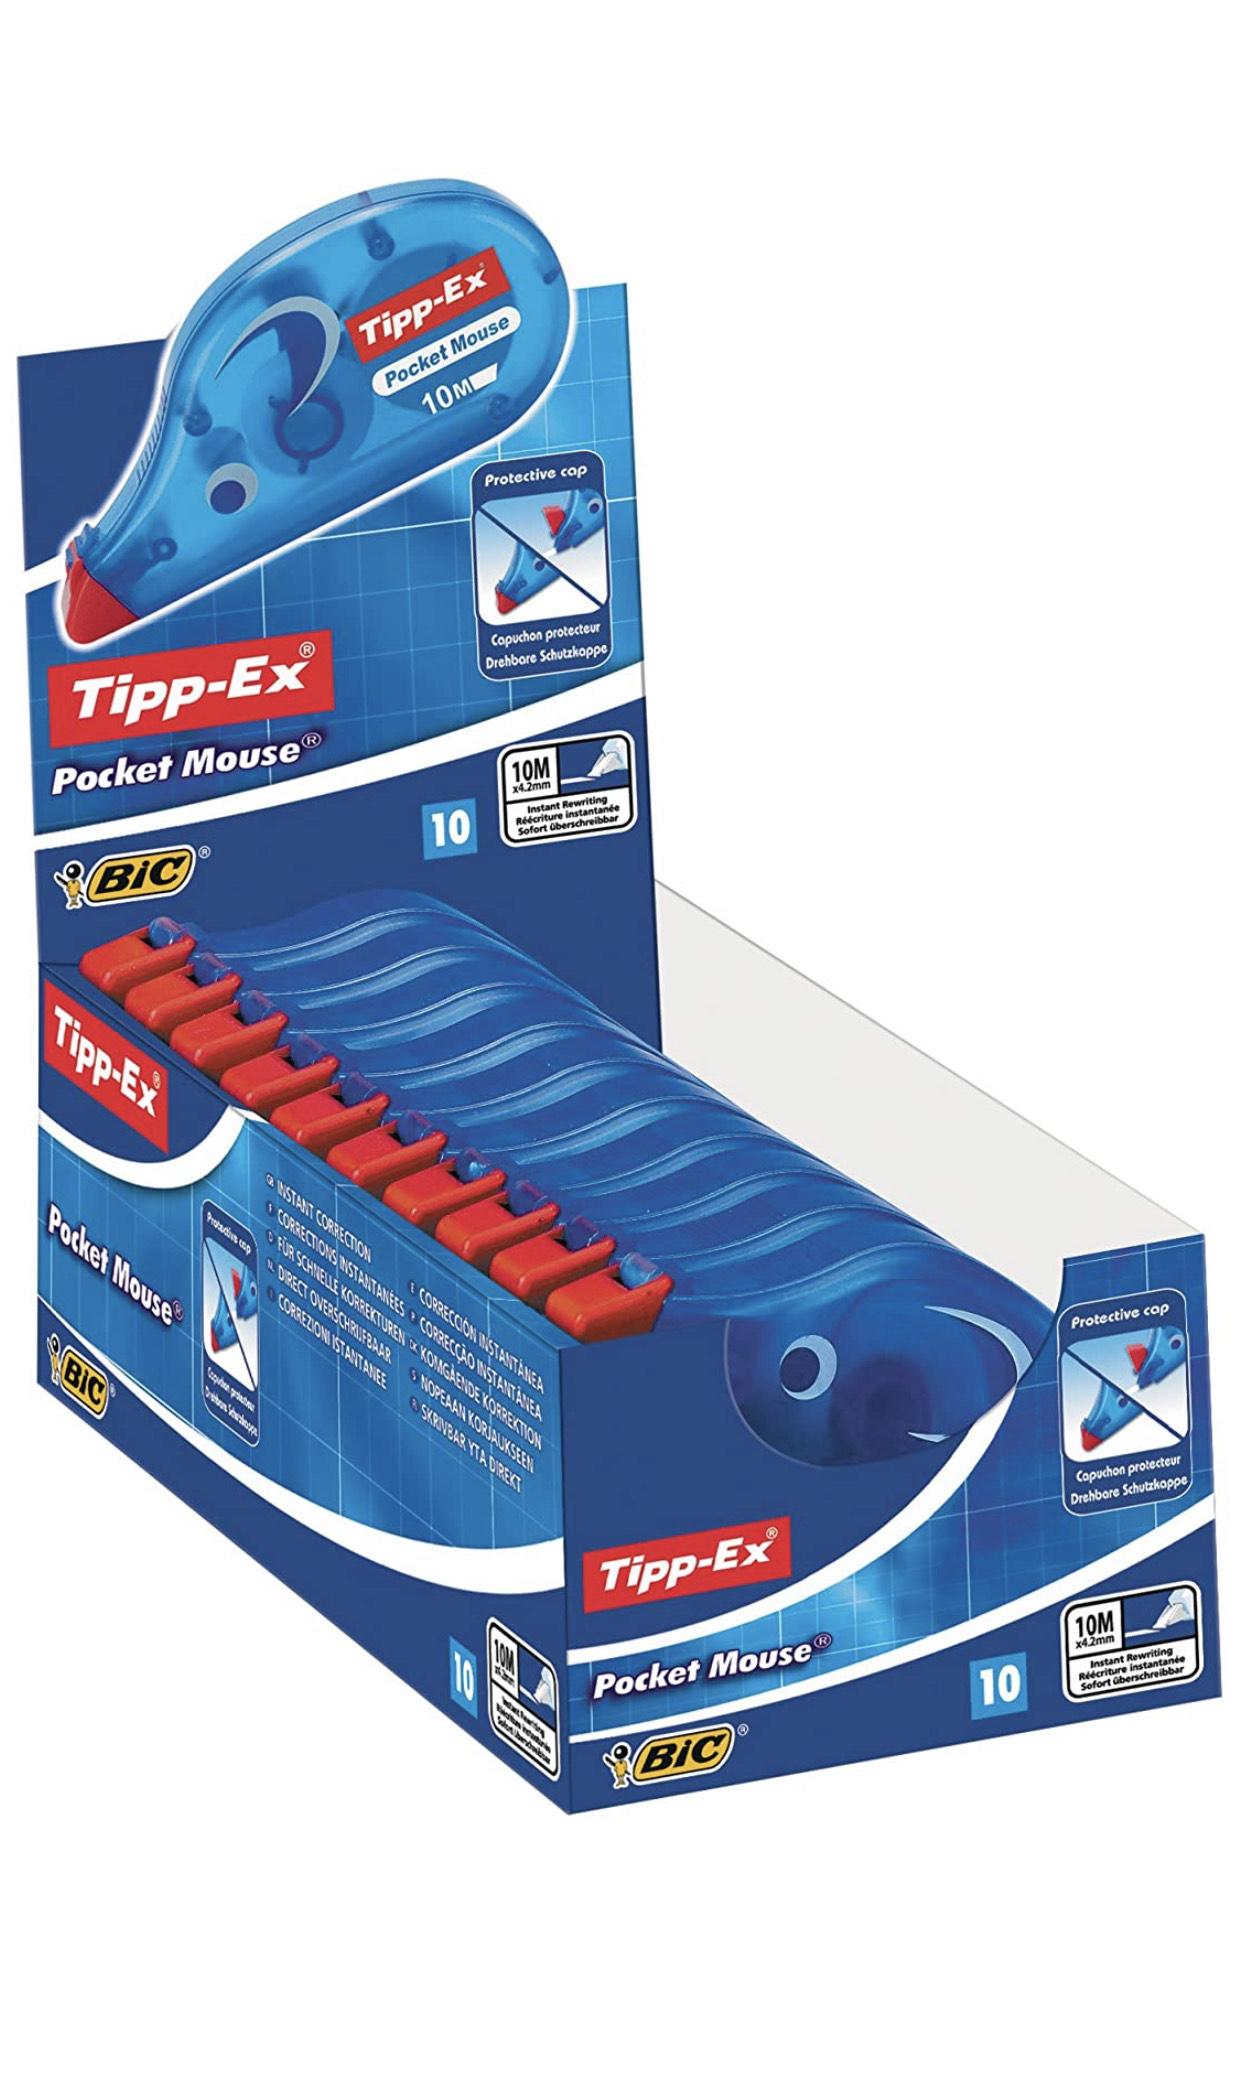 Tipp-Ex Pocket Mouse 10 Stück *Prime*